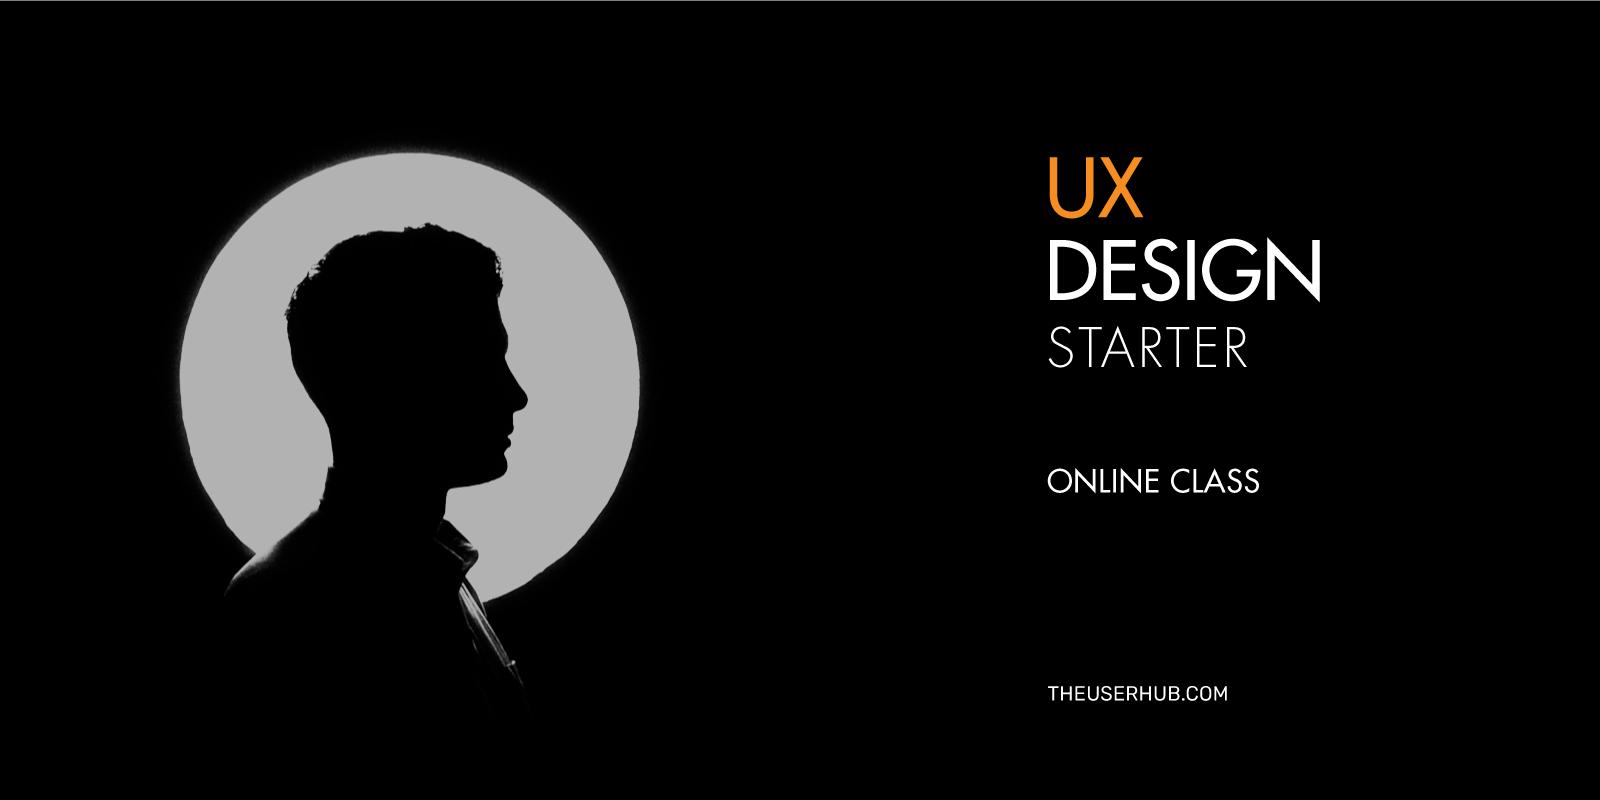 UX Design online short course for beginners